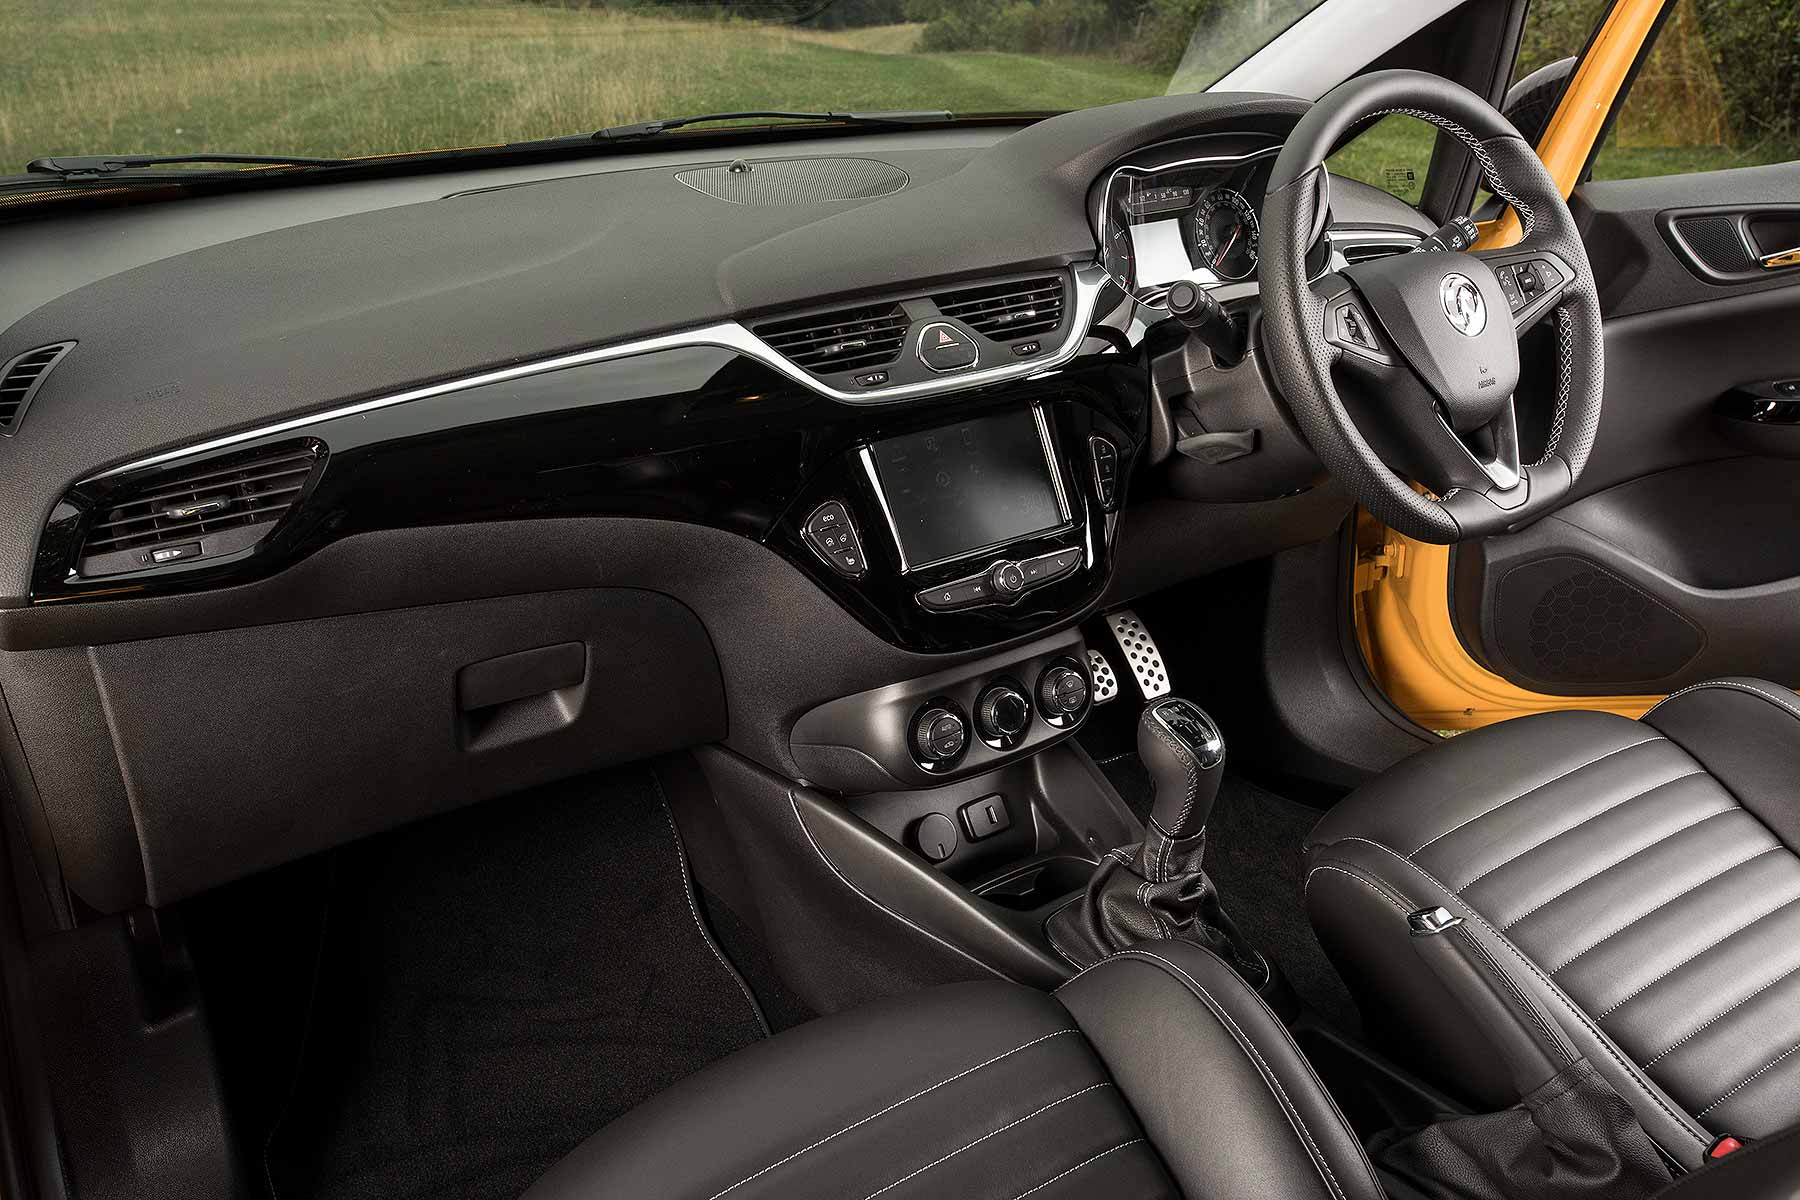 Vauxhall Corsa GSi (2018)